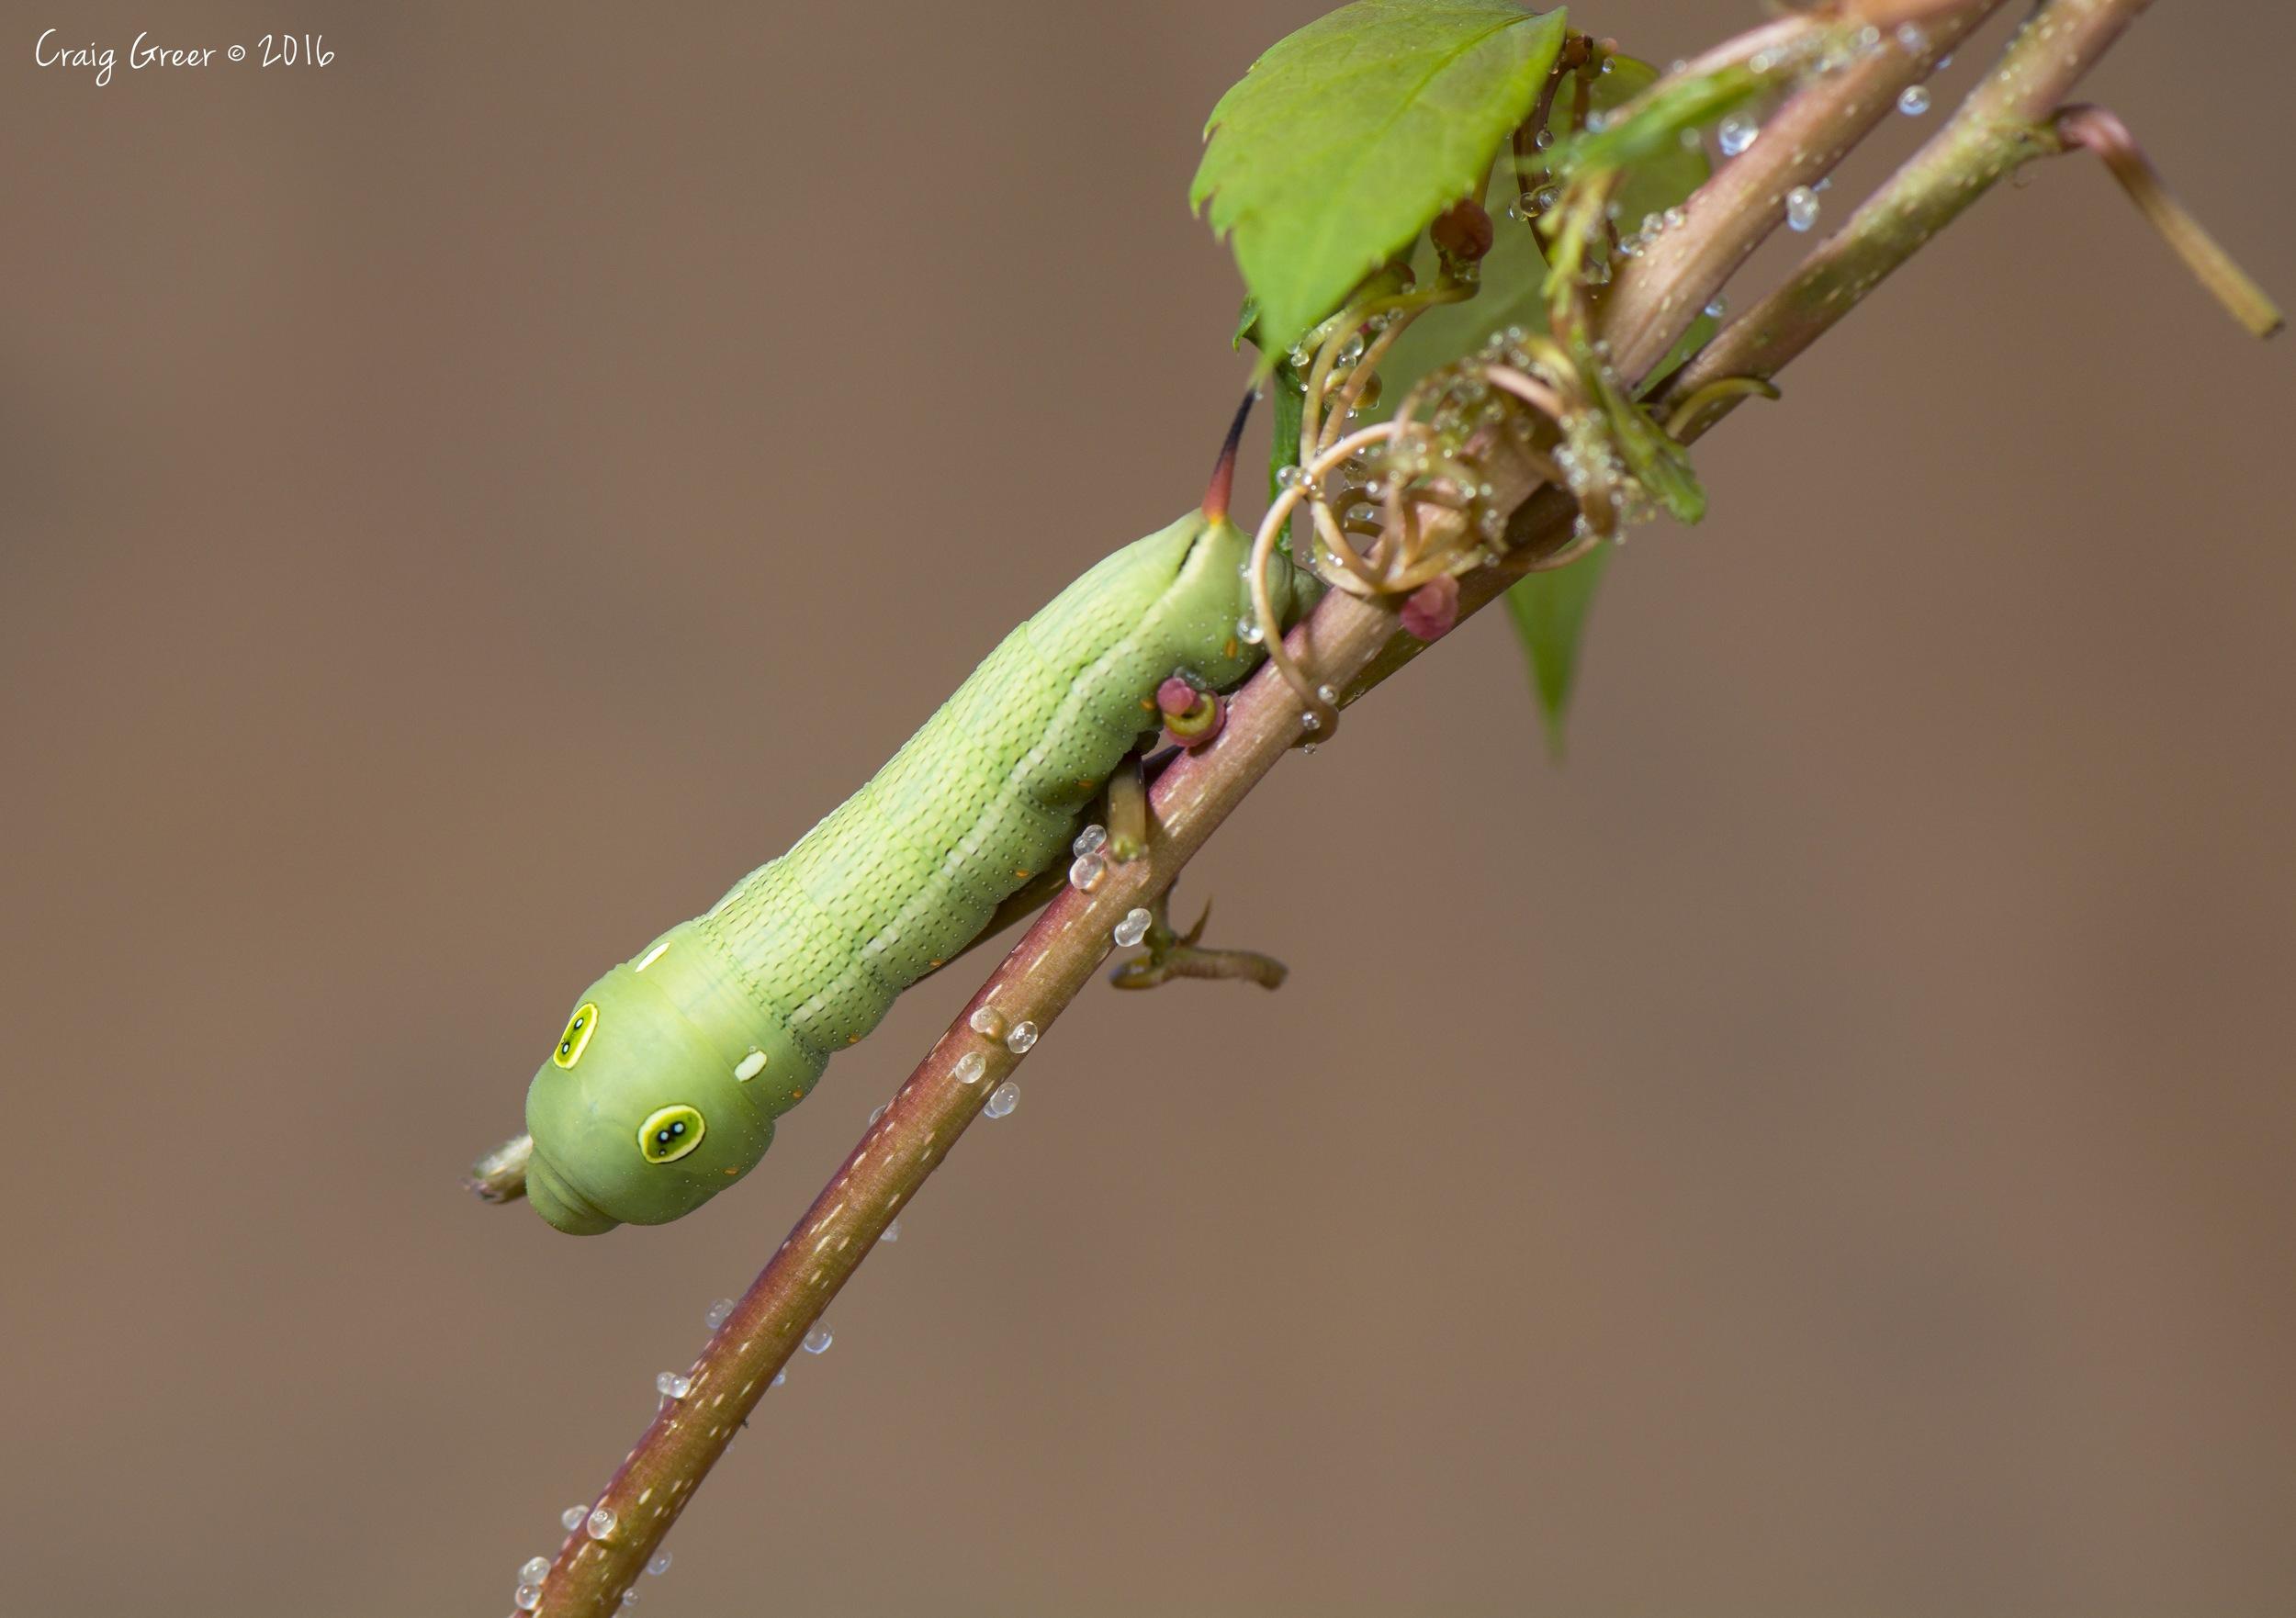 Vine-Hawkmoth-Green-Birkenhead-07-02-16.jpg